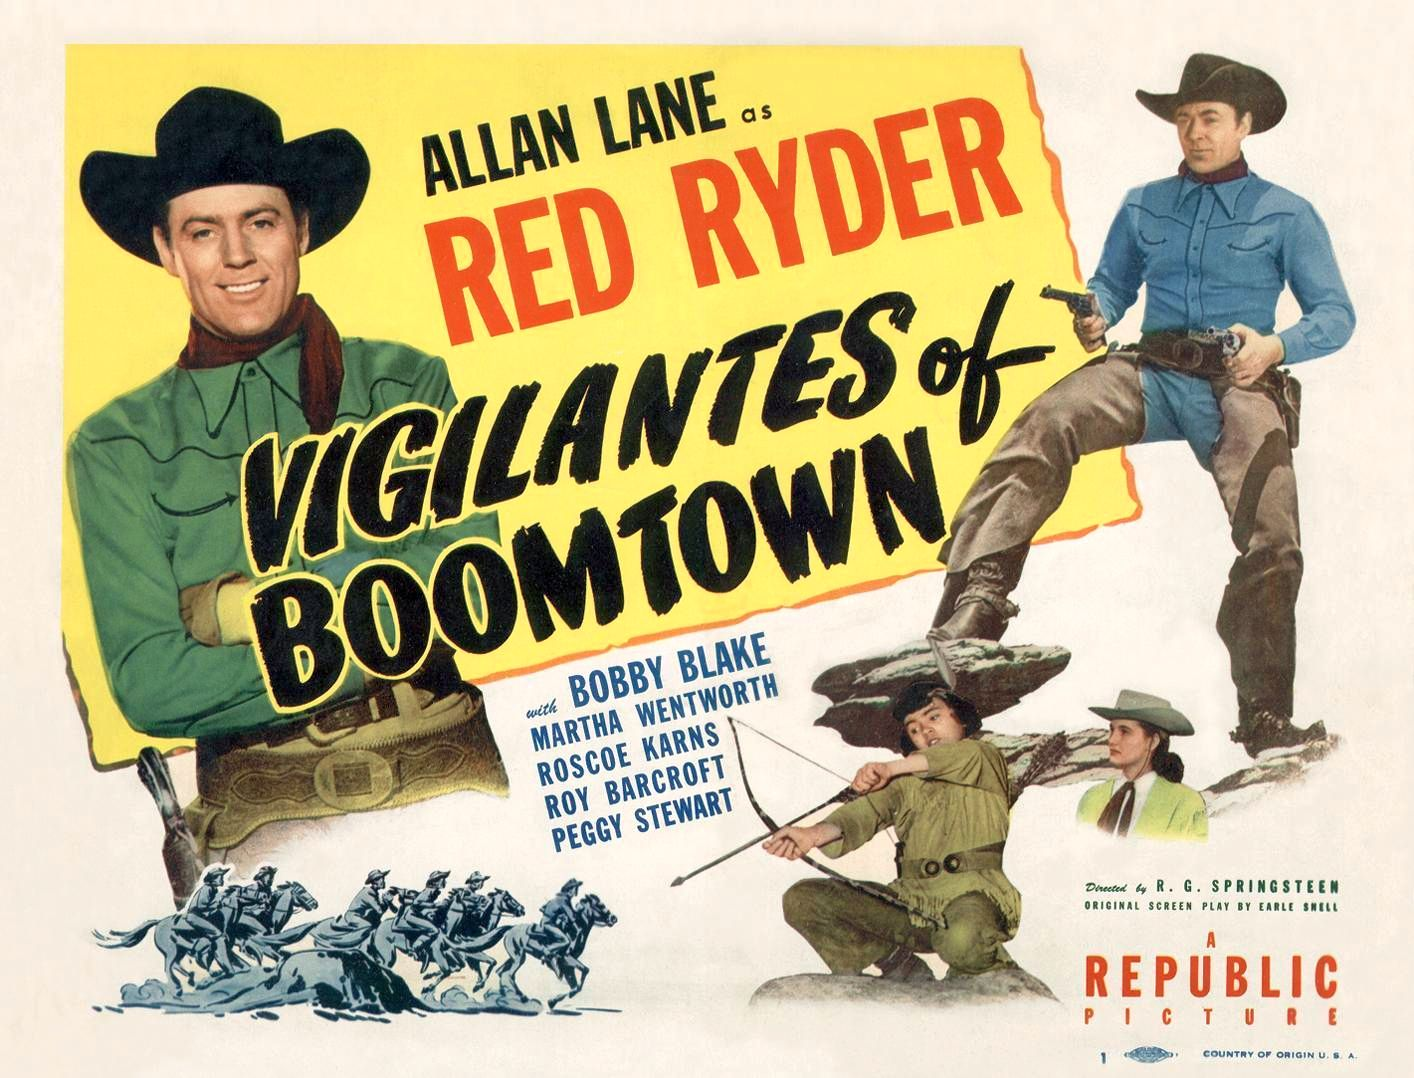 Robert Blake, Allan Lane, and Peggy Stewart in Vigilantes of Boomtown (1947)